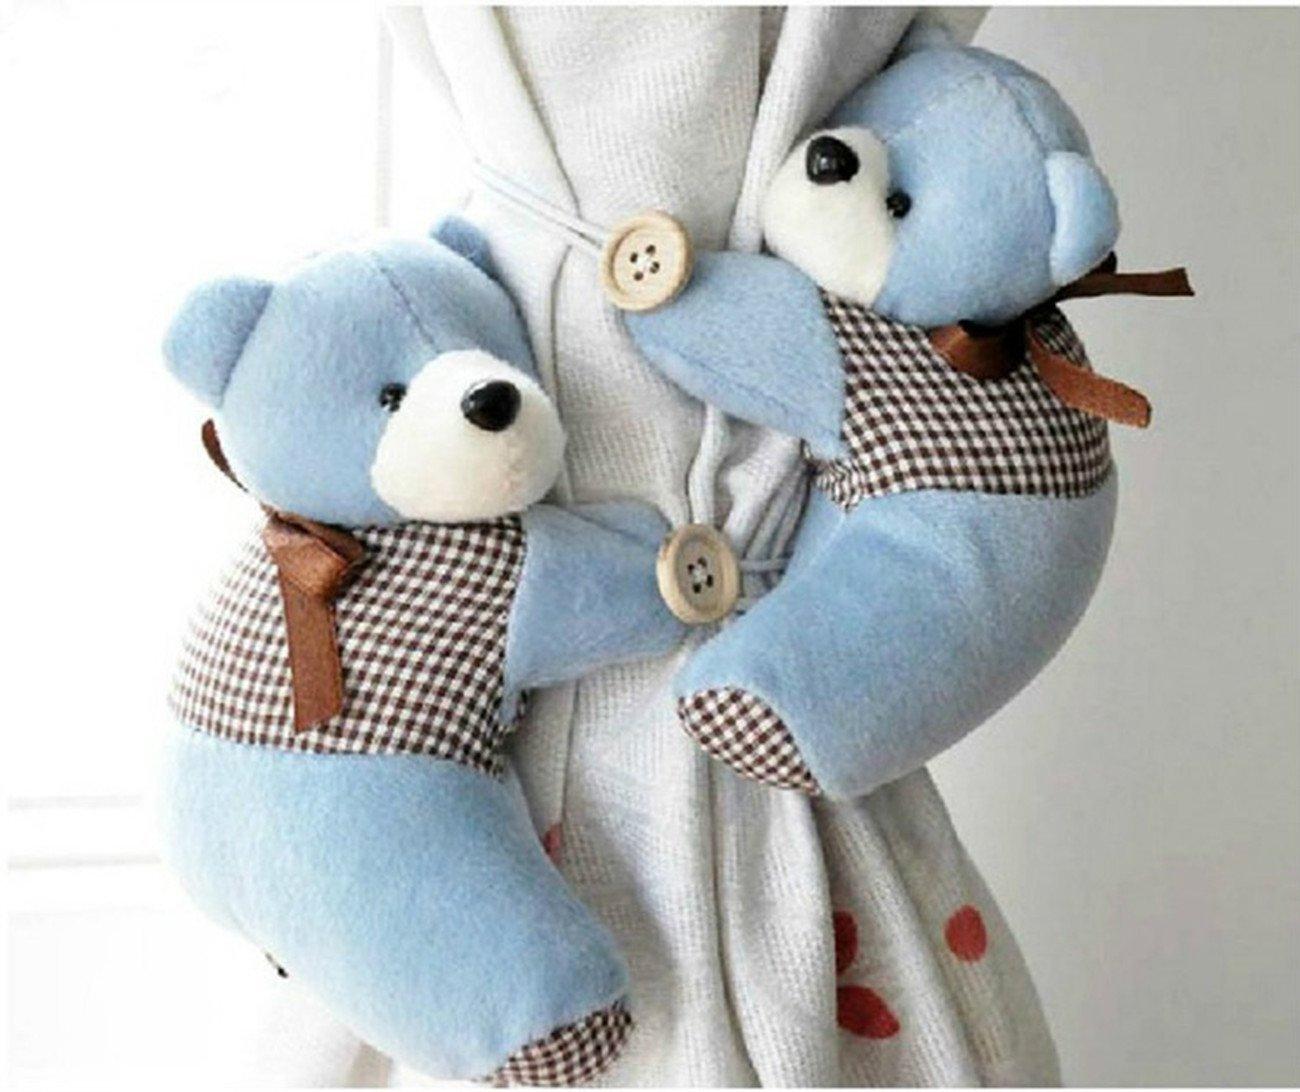 Jackie 1 Pair Blue Baby Kid Toddler Child Infant Nursery Room Bedroom Animal Cartoon Plush Bear Shaped Window Curtain Tieback Tie Back Decor Holder Buckle Holdback Belt Hooks Clip Clasps Toy